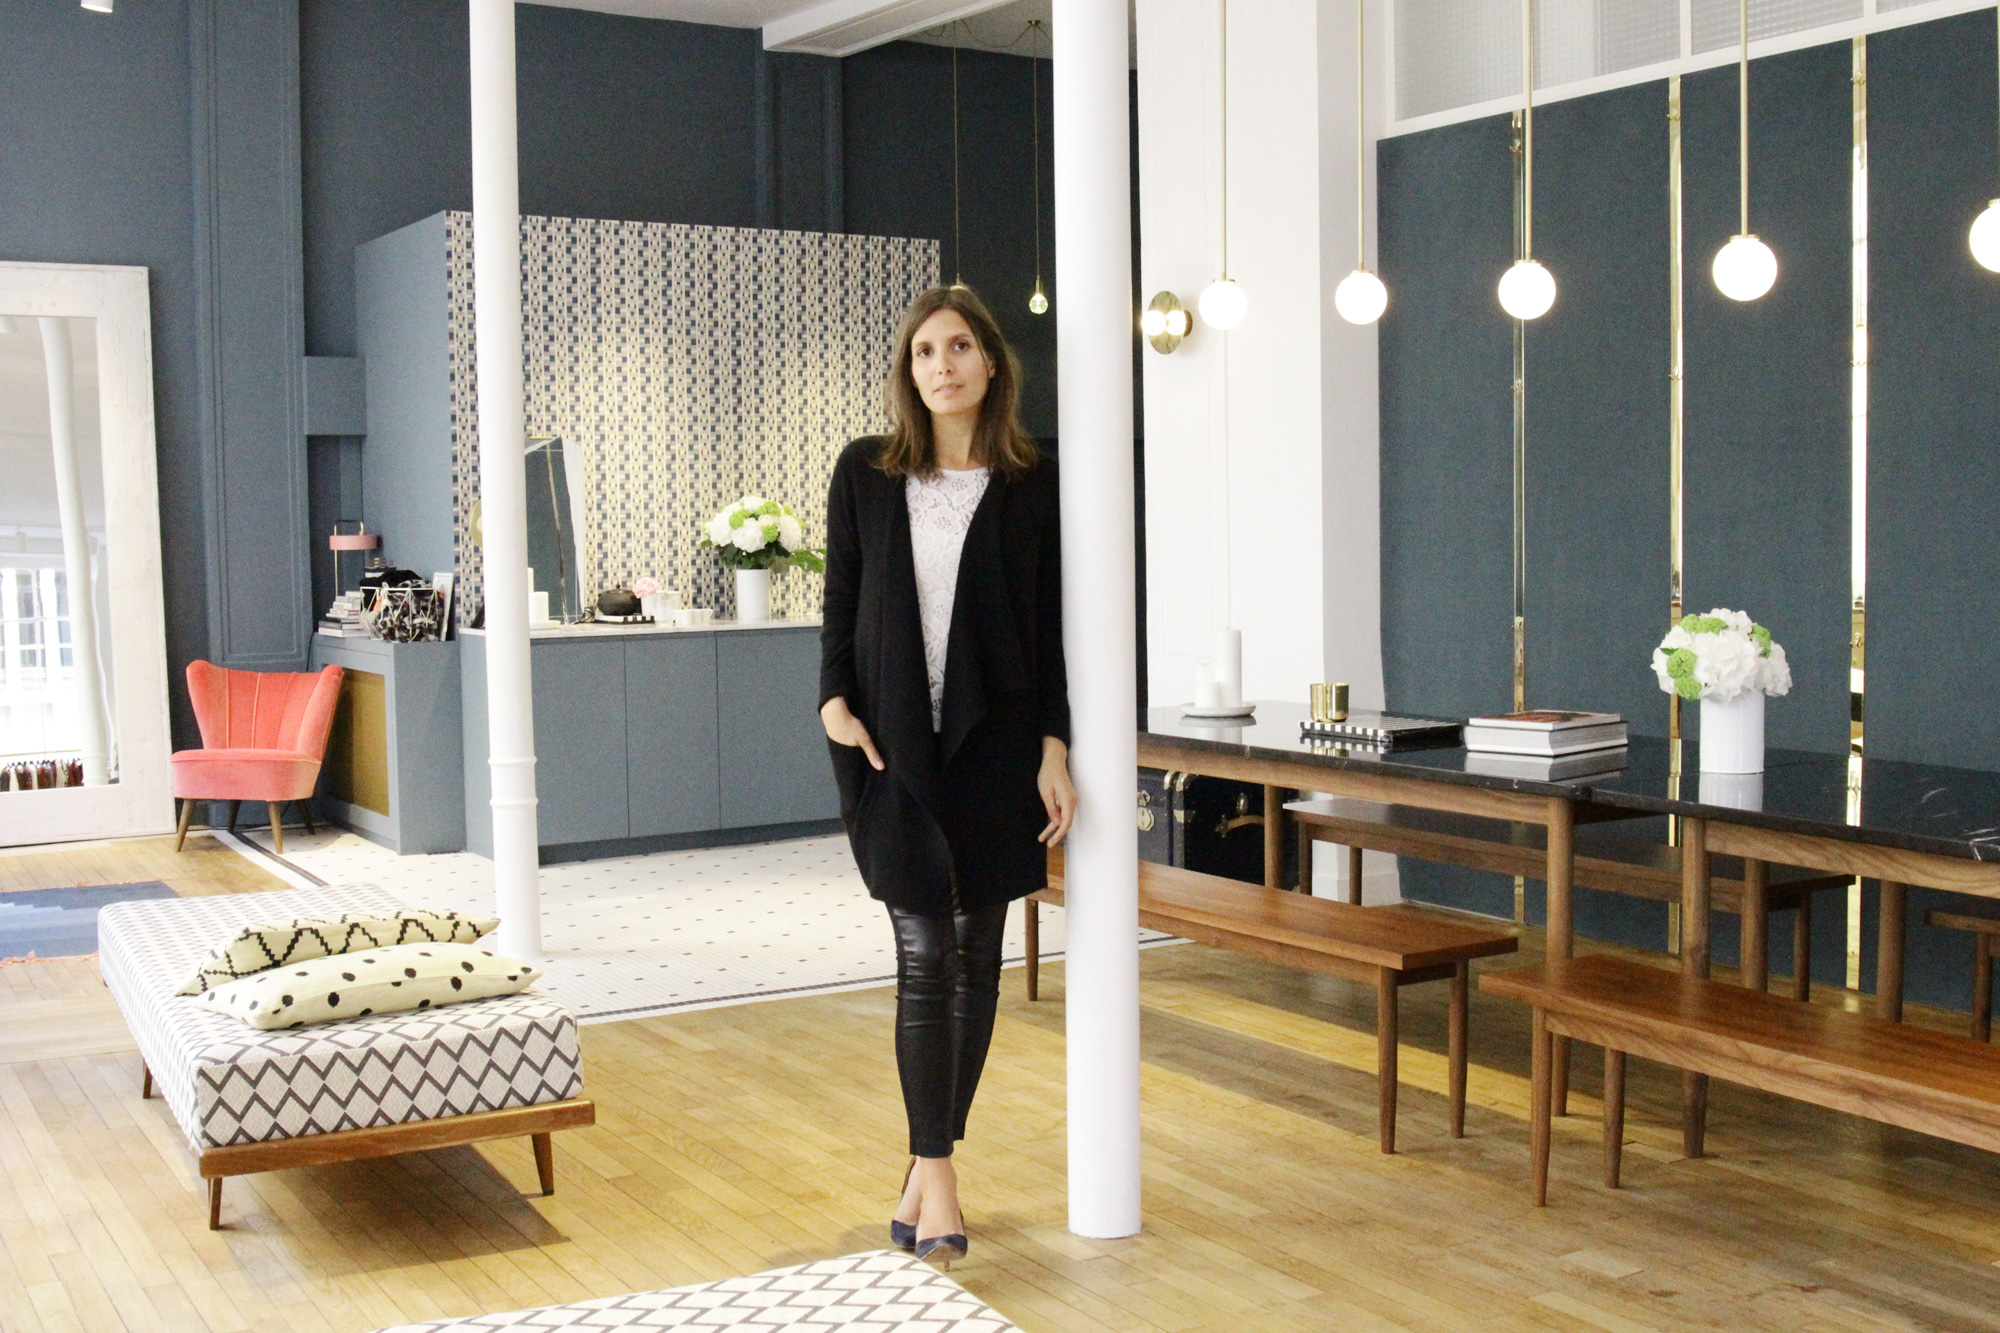 The Lifestyle Meets Sézane Founder, Morgane Sézalory